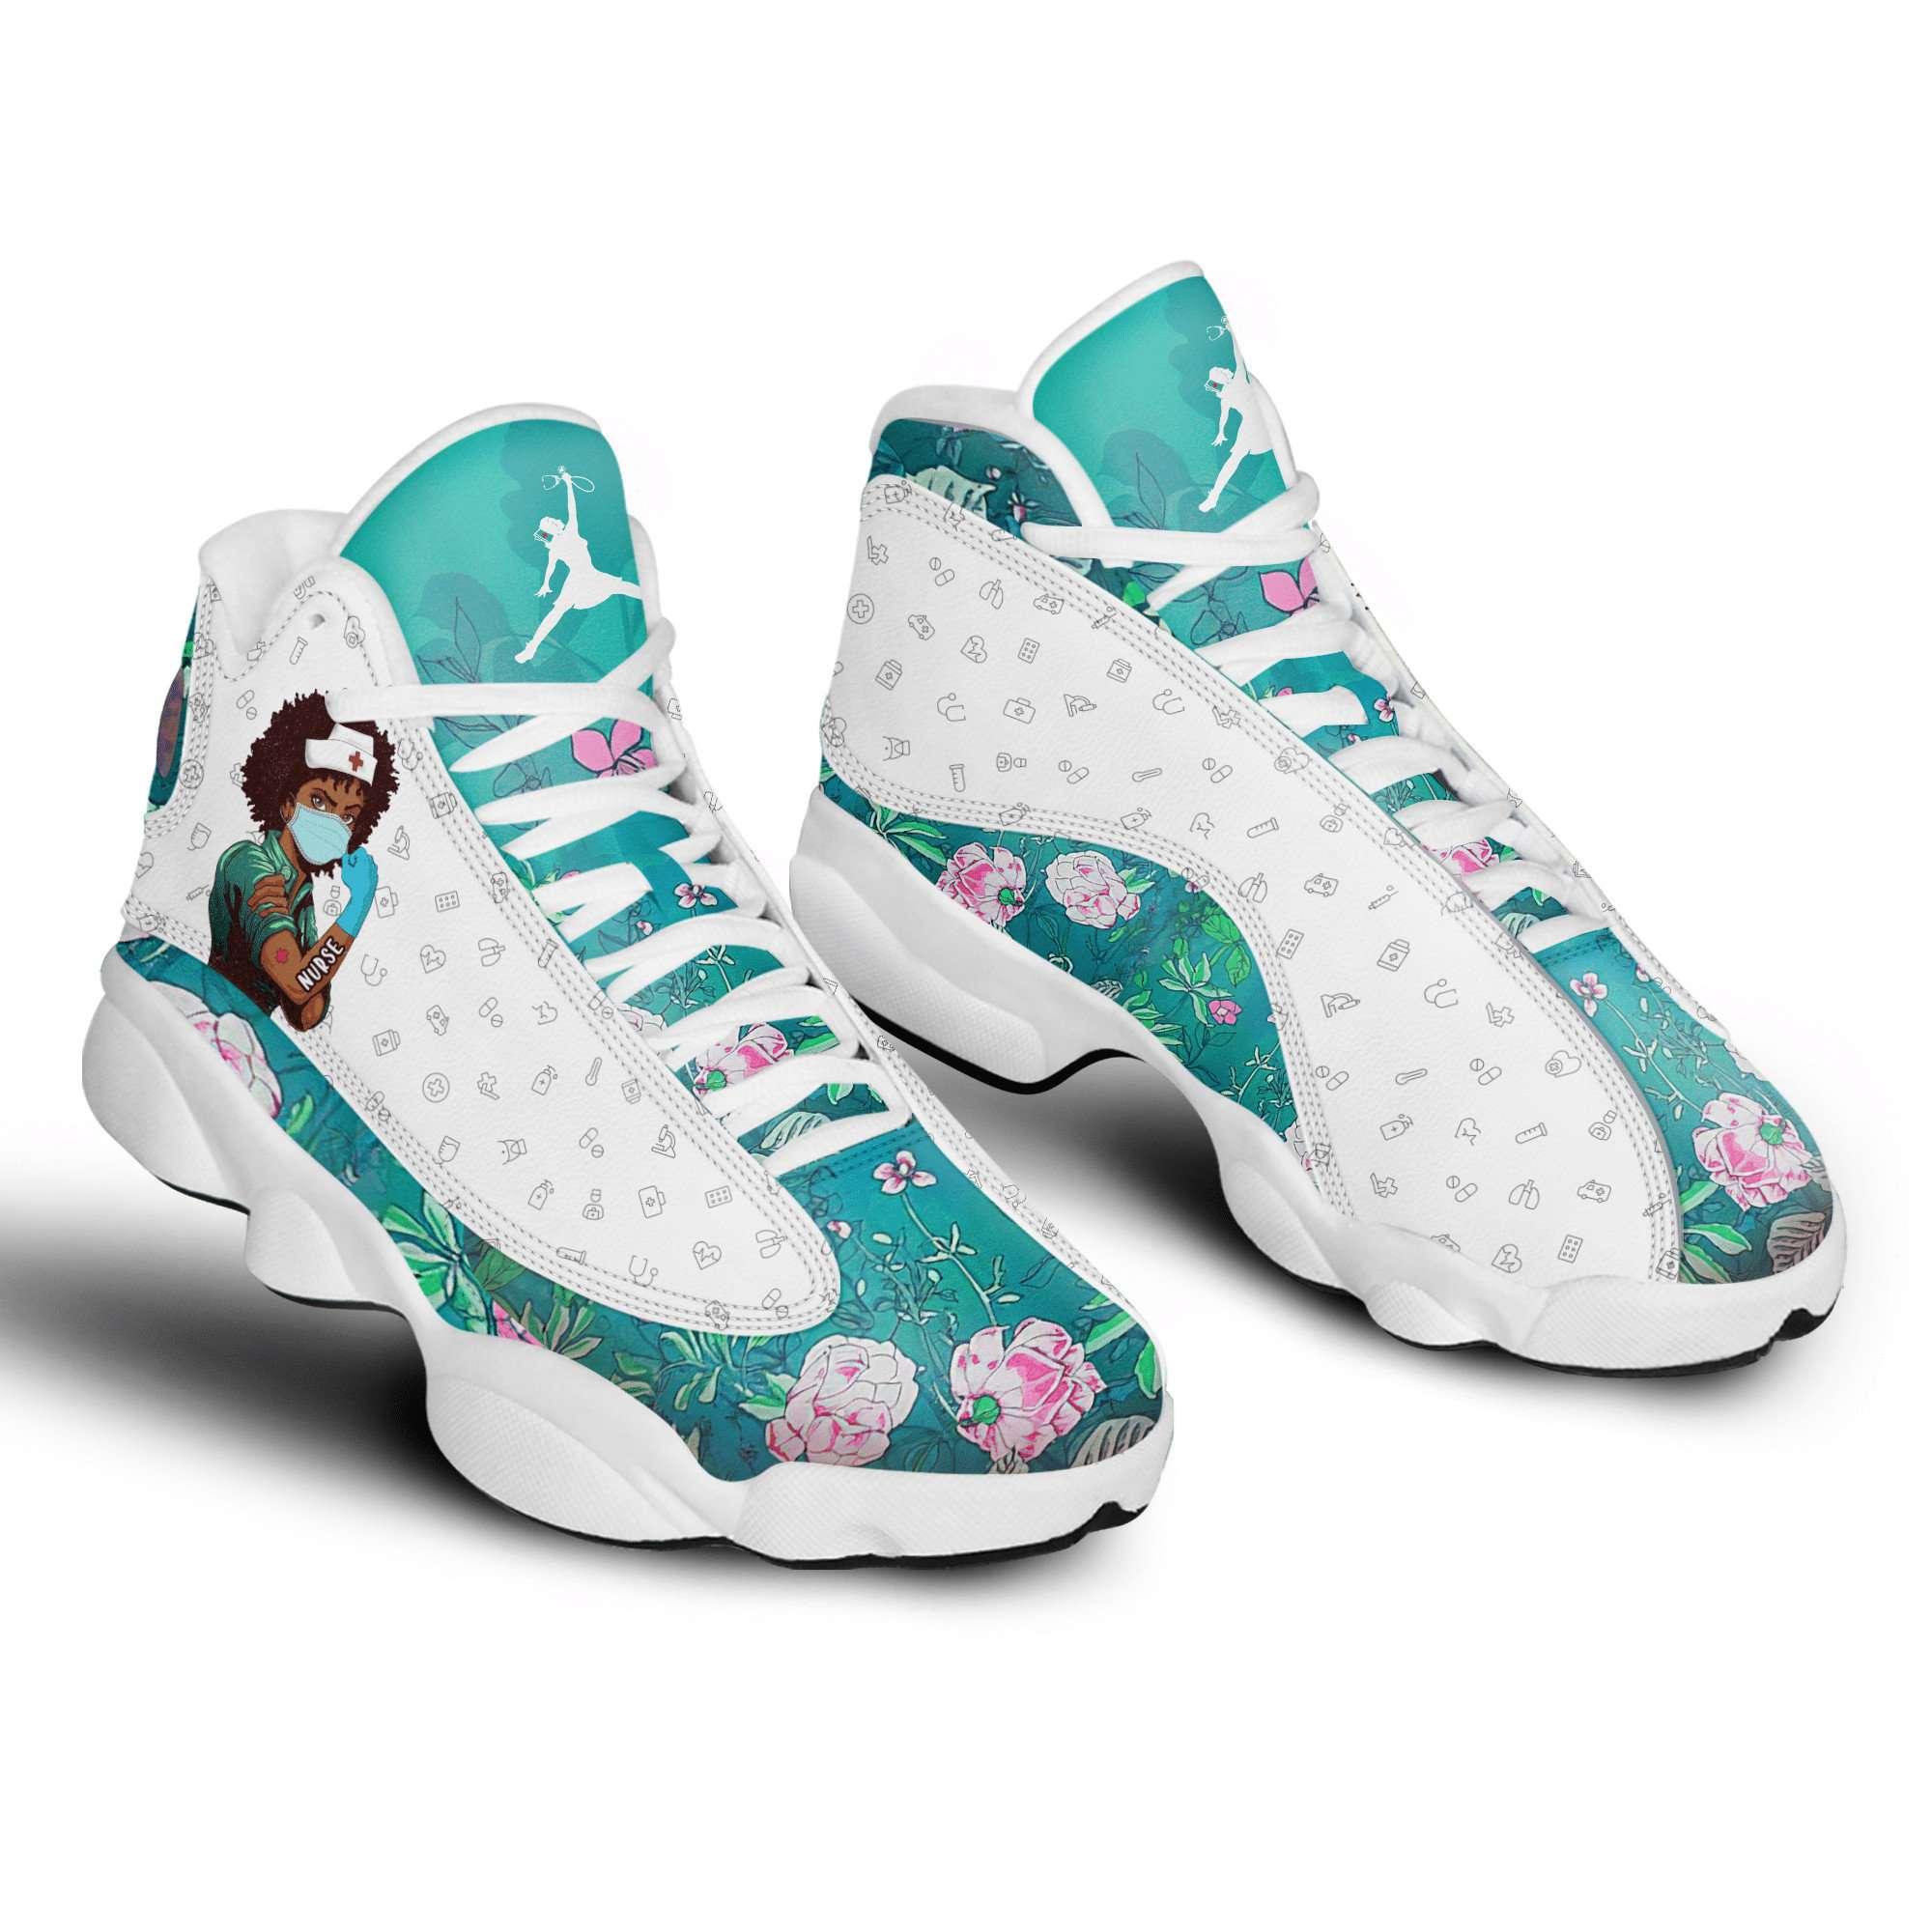 Nurse Floral Melanated Air Jordan Shoes